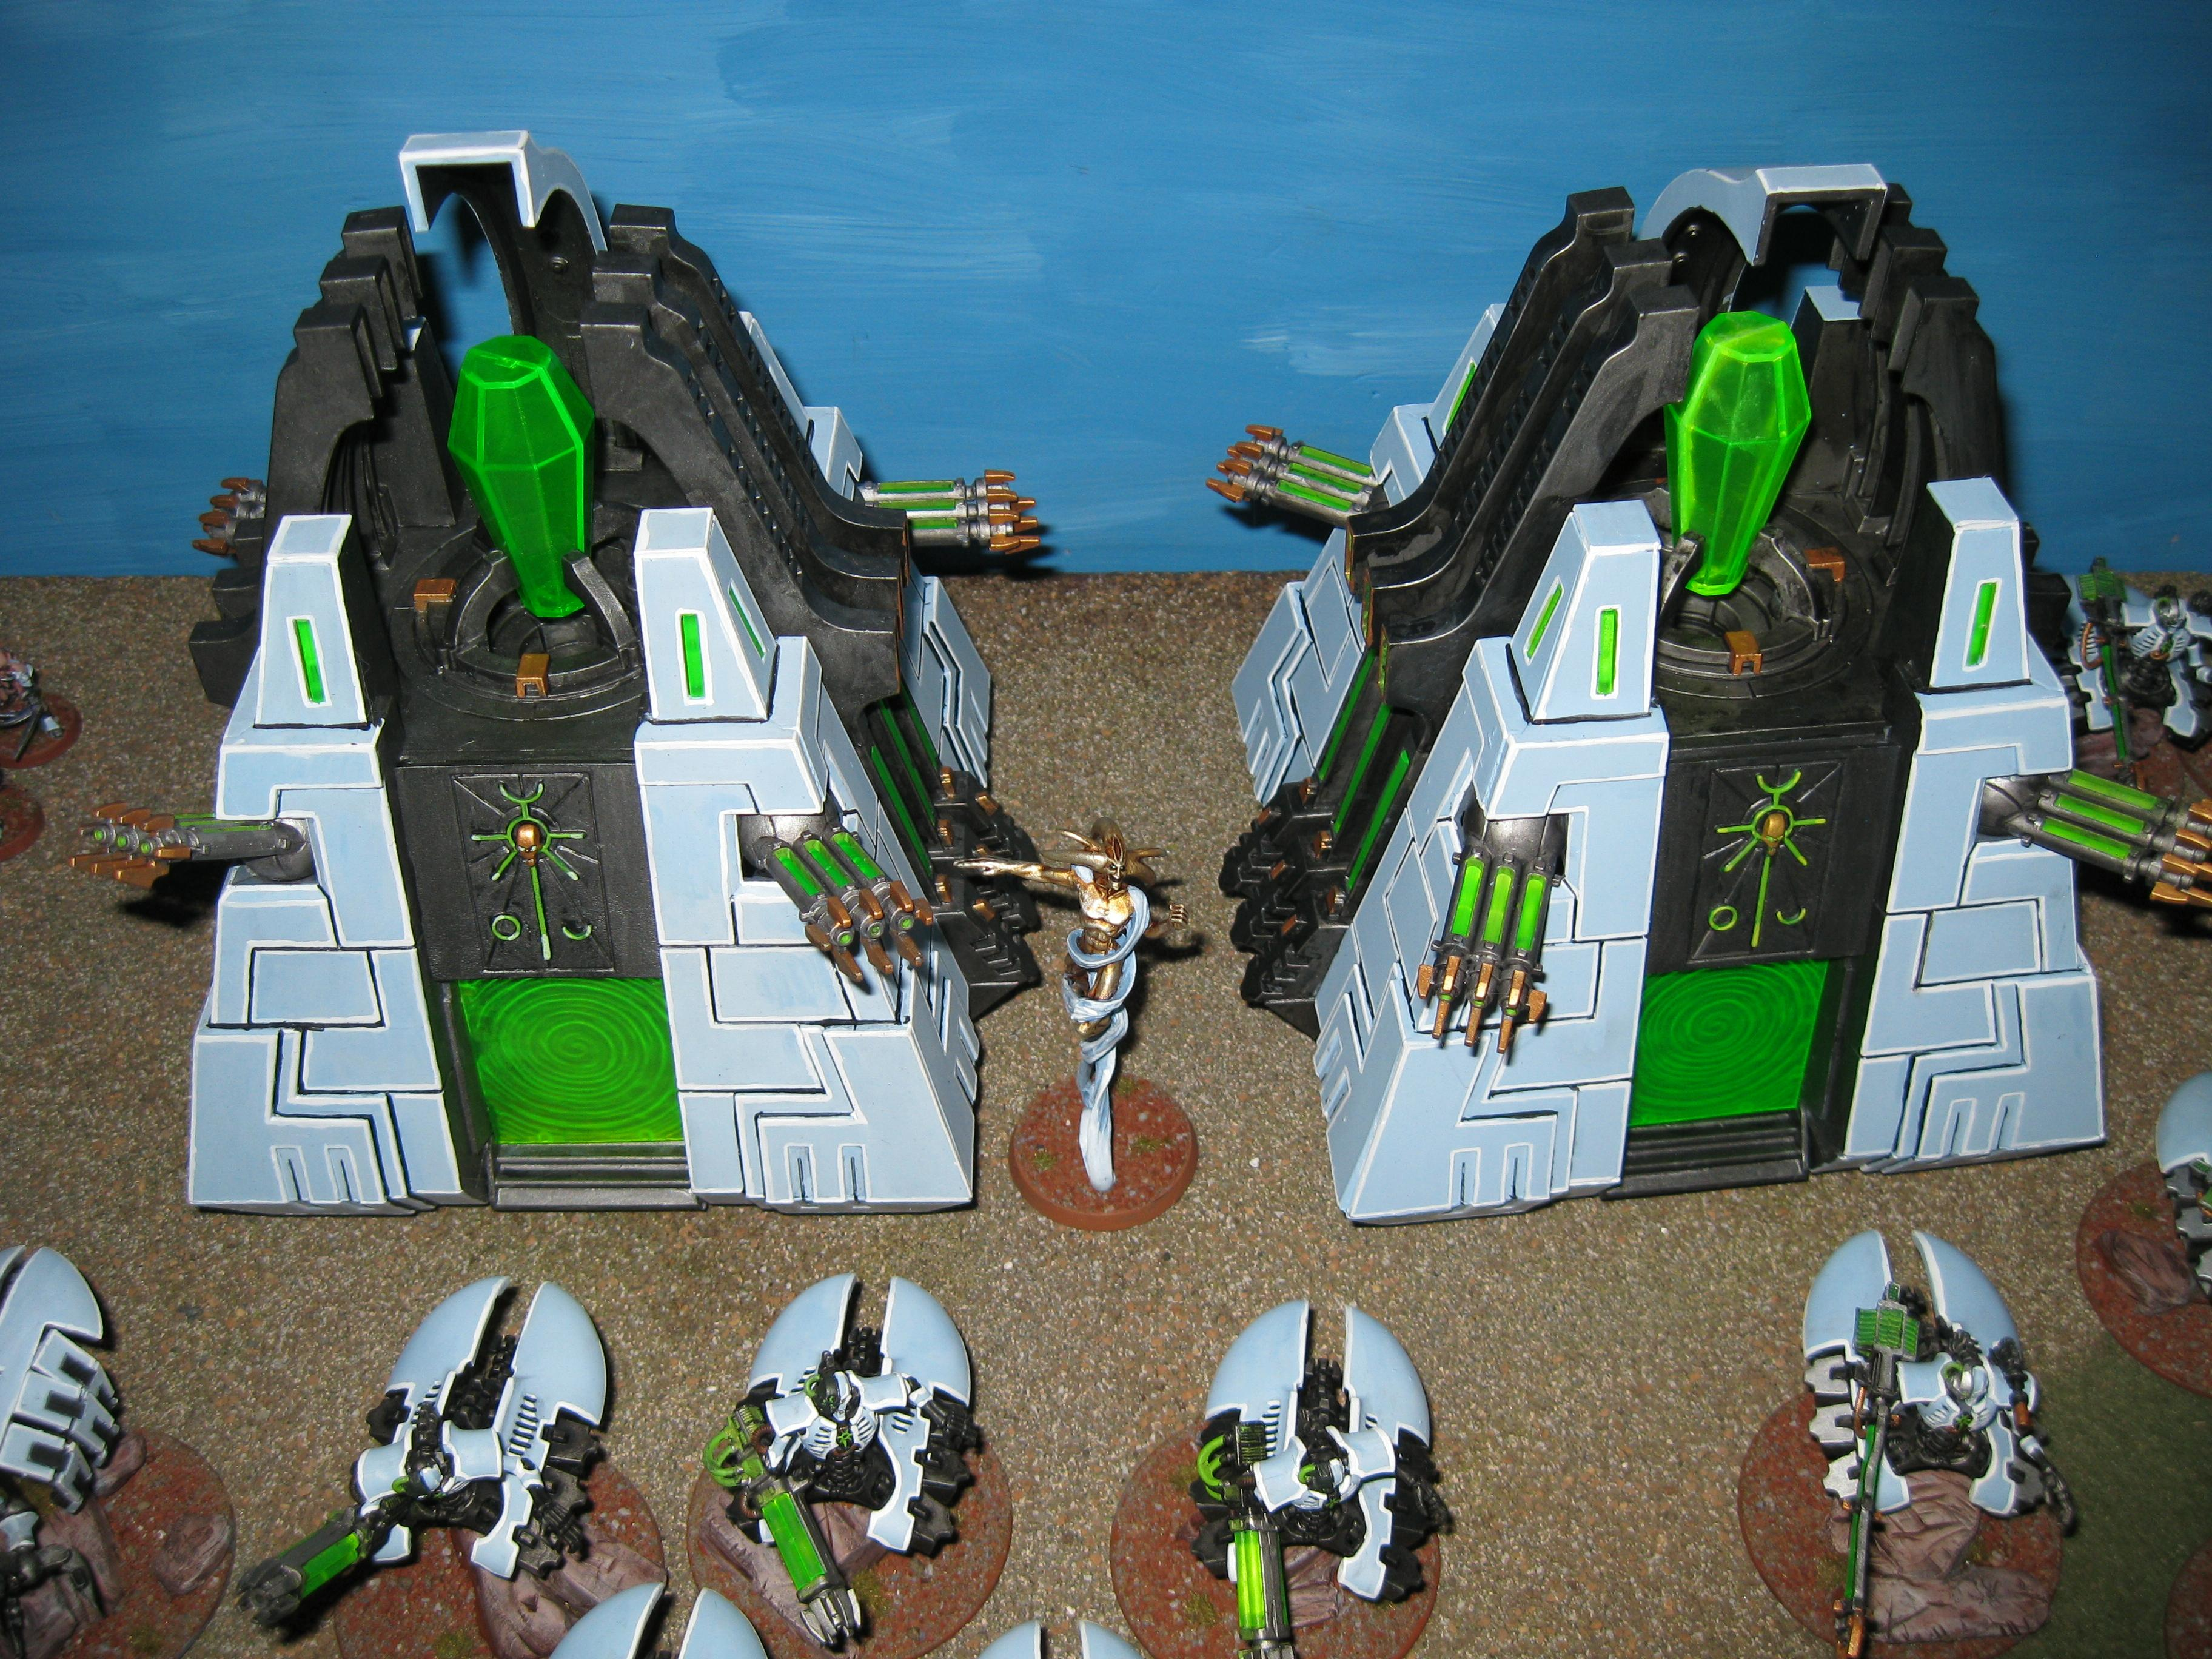 Deciever, Monoliths, Necrons